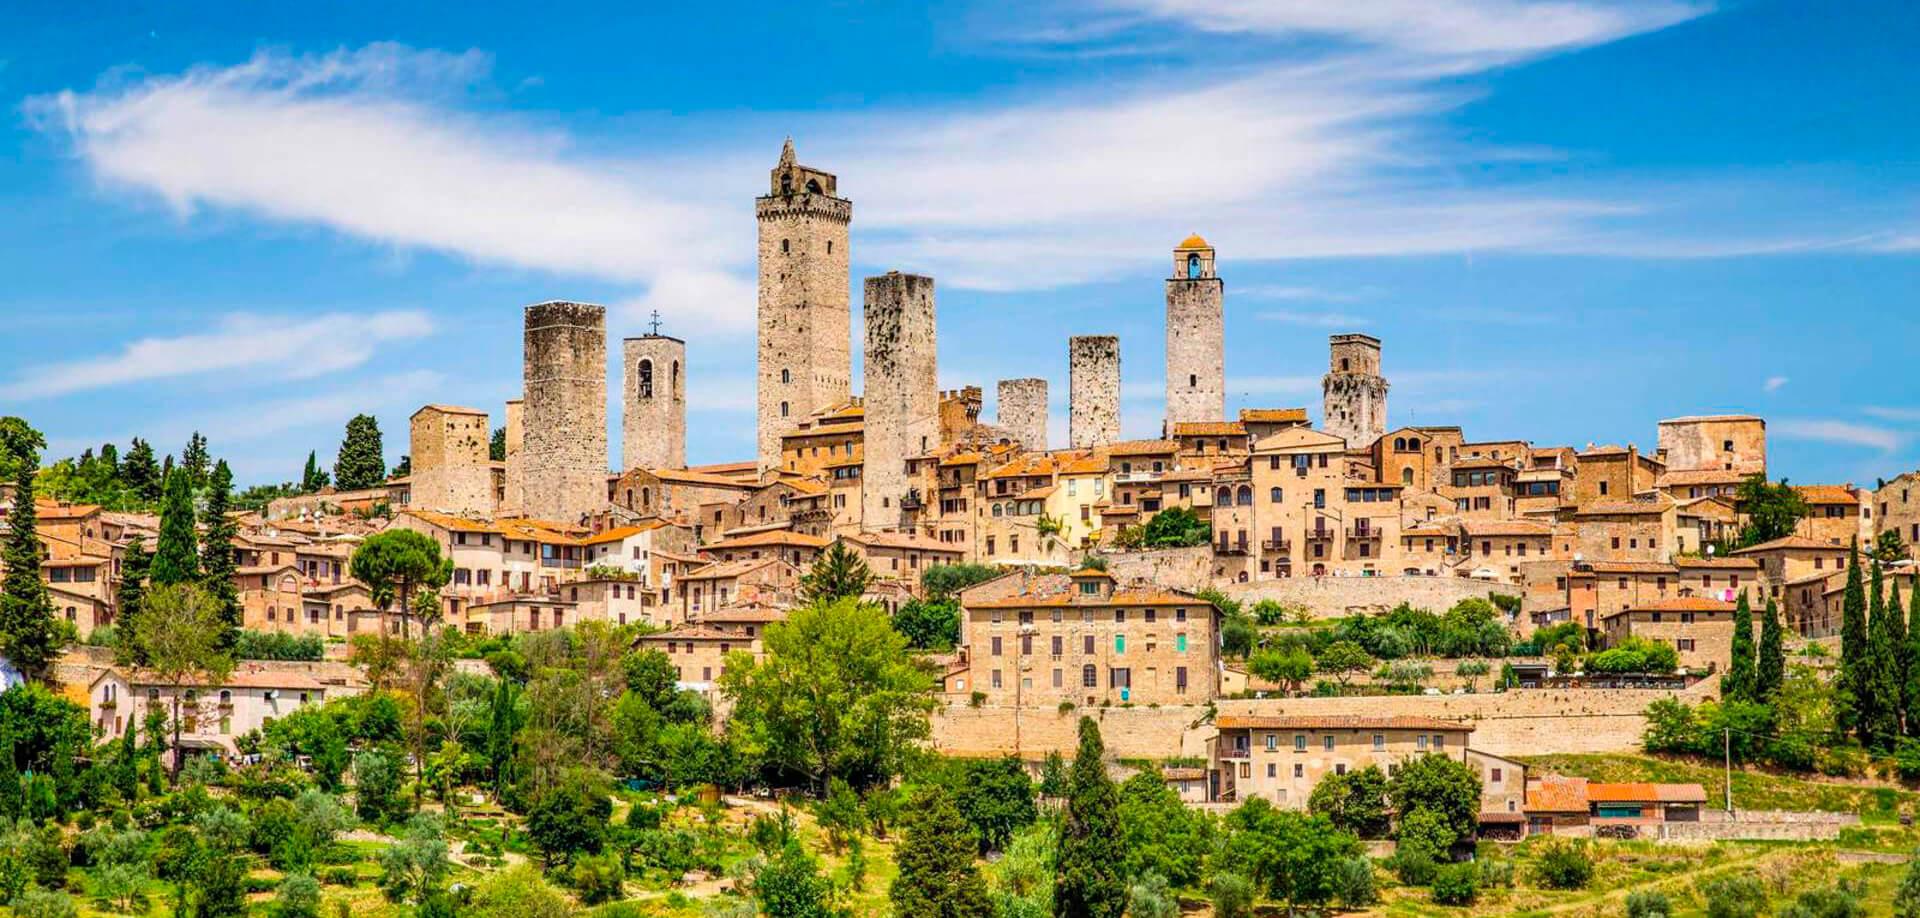 Siena - Firenze